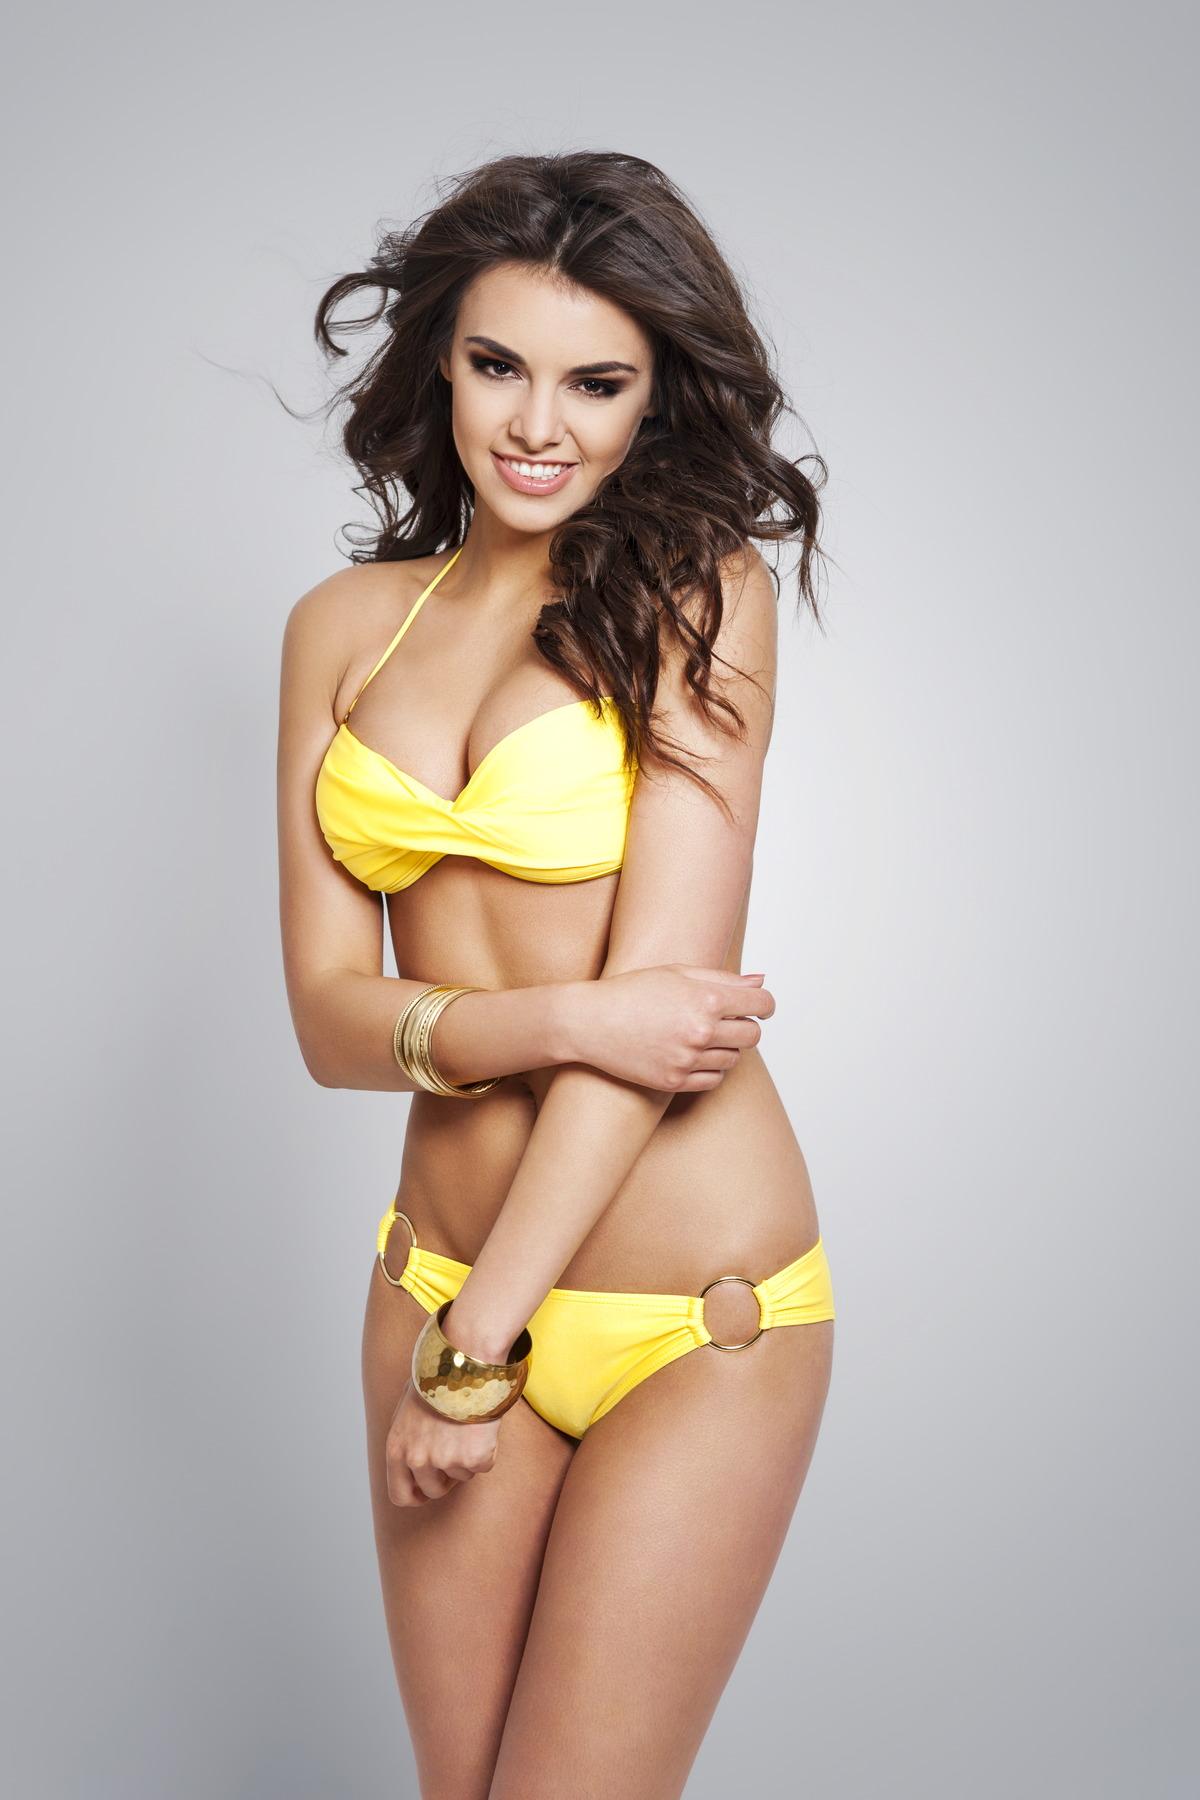 Sexy Girl im gelben Bikini